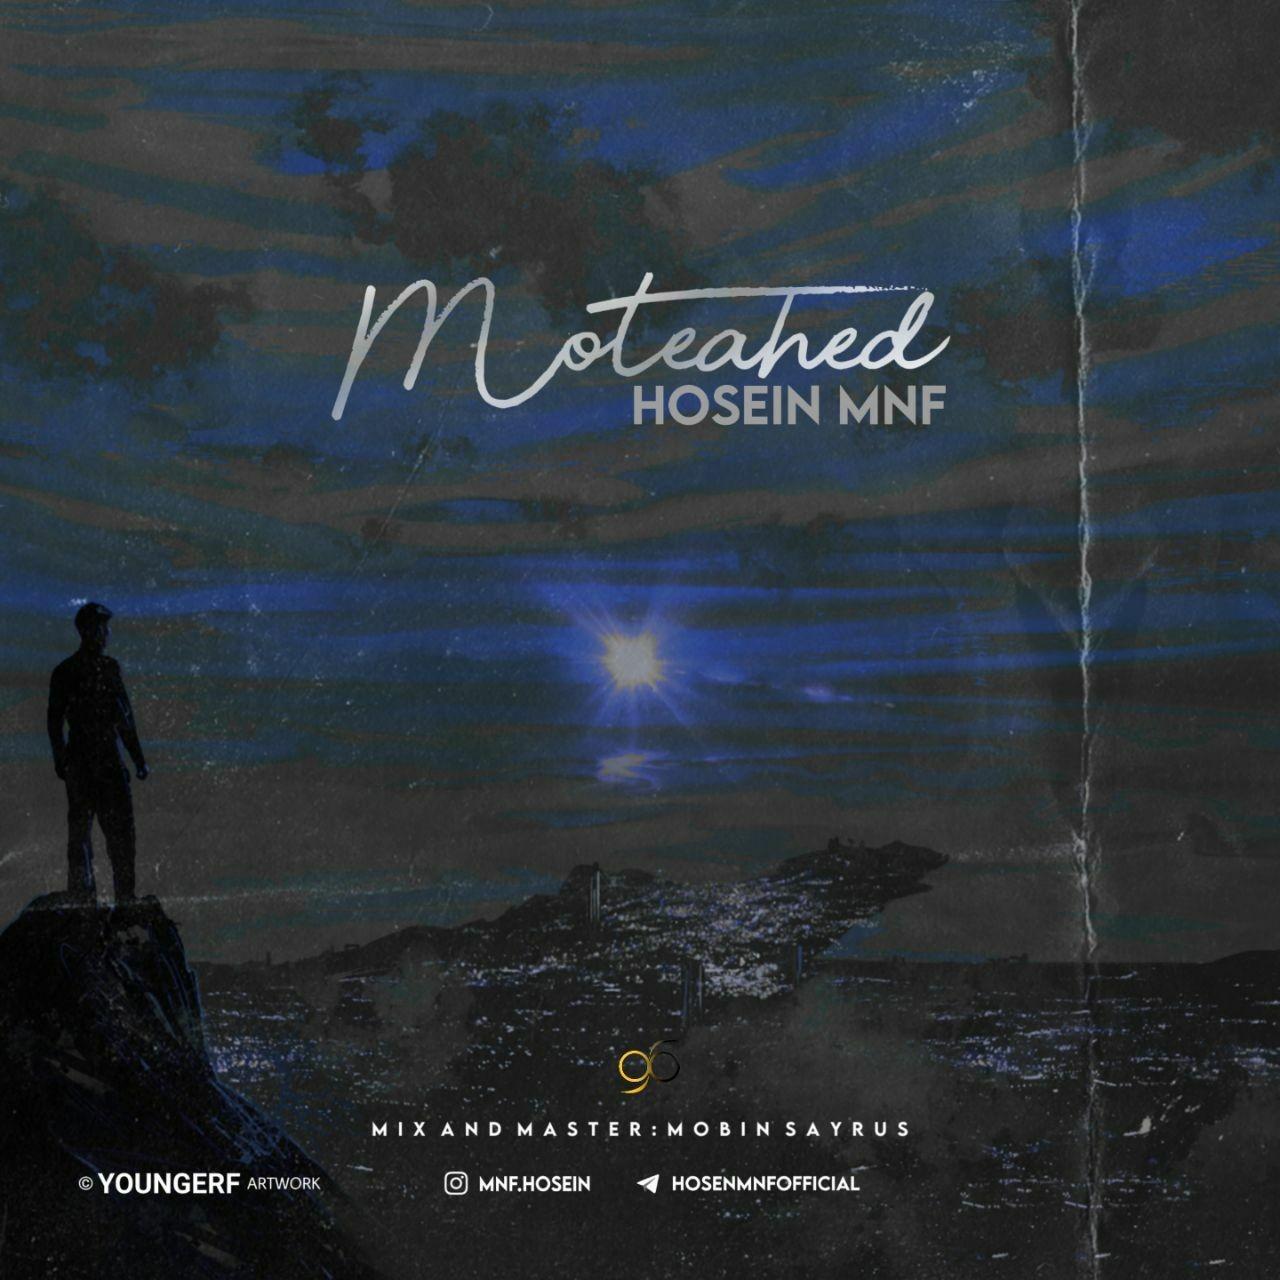 Hosein MNF – MoteAhed